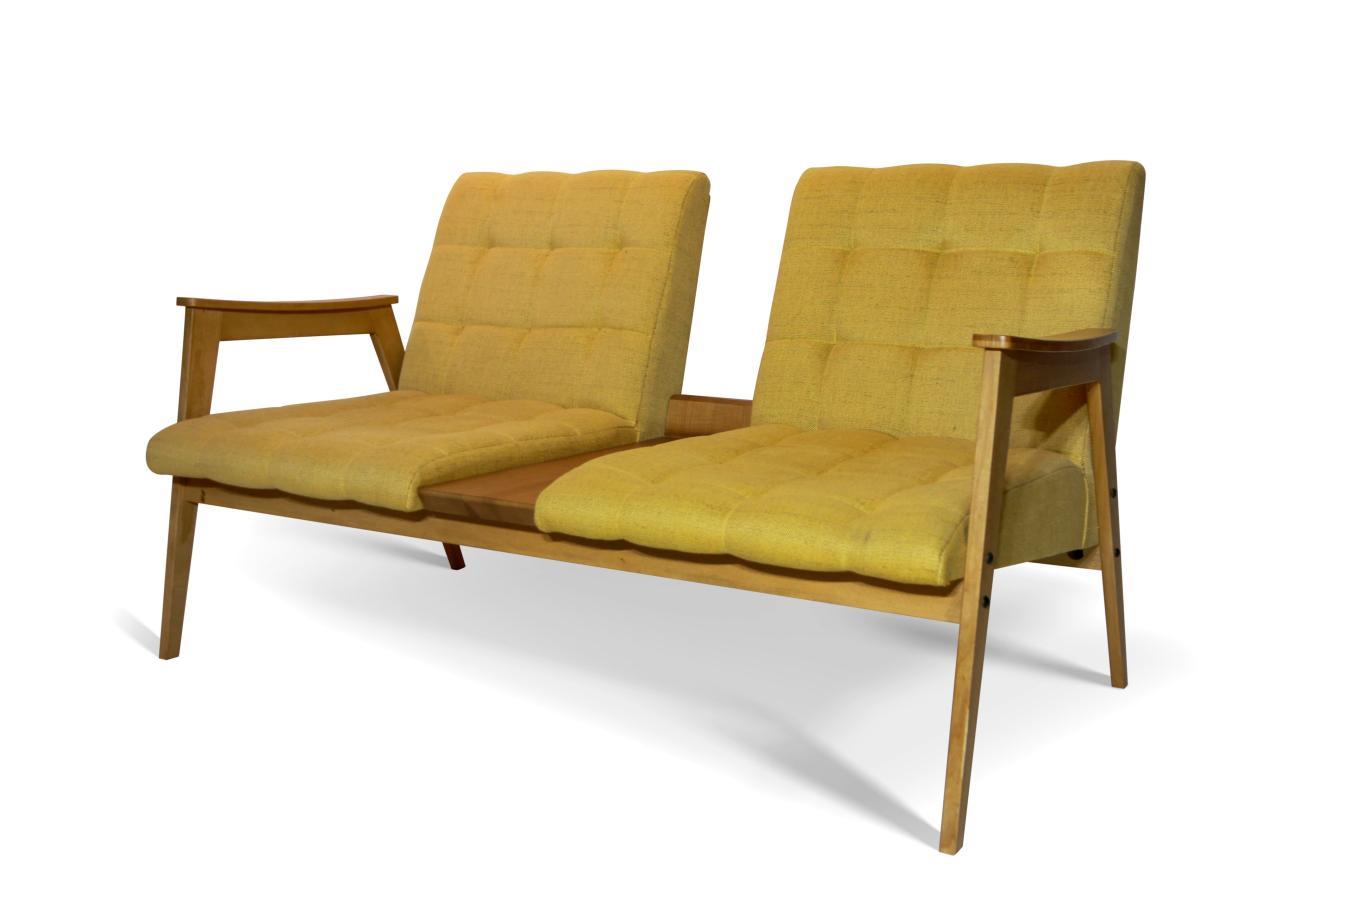 Диван Метеор - Sputnikfurniture, мебель модерн, мебель спутник, мебель Sputnikfurniture, Mid Century Modern